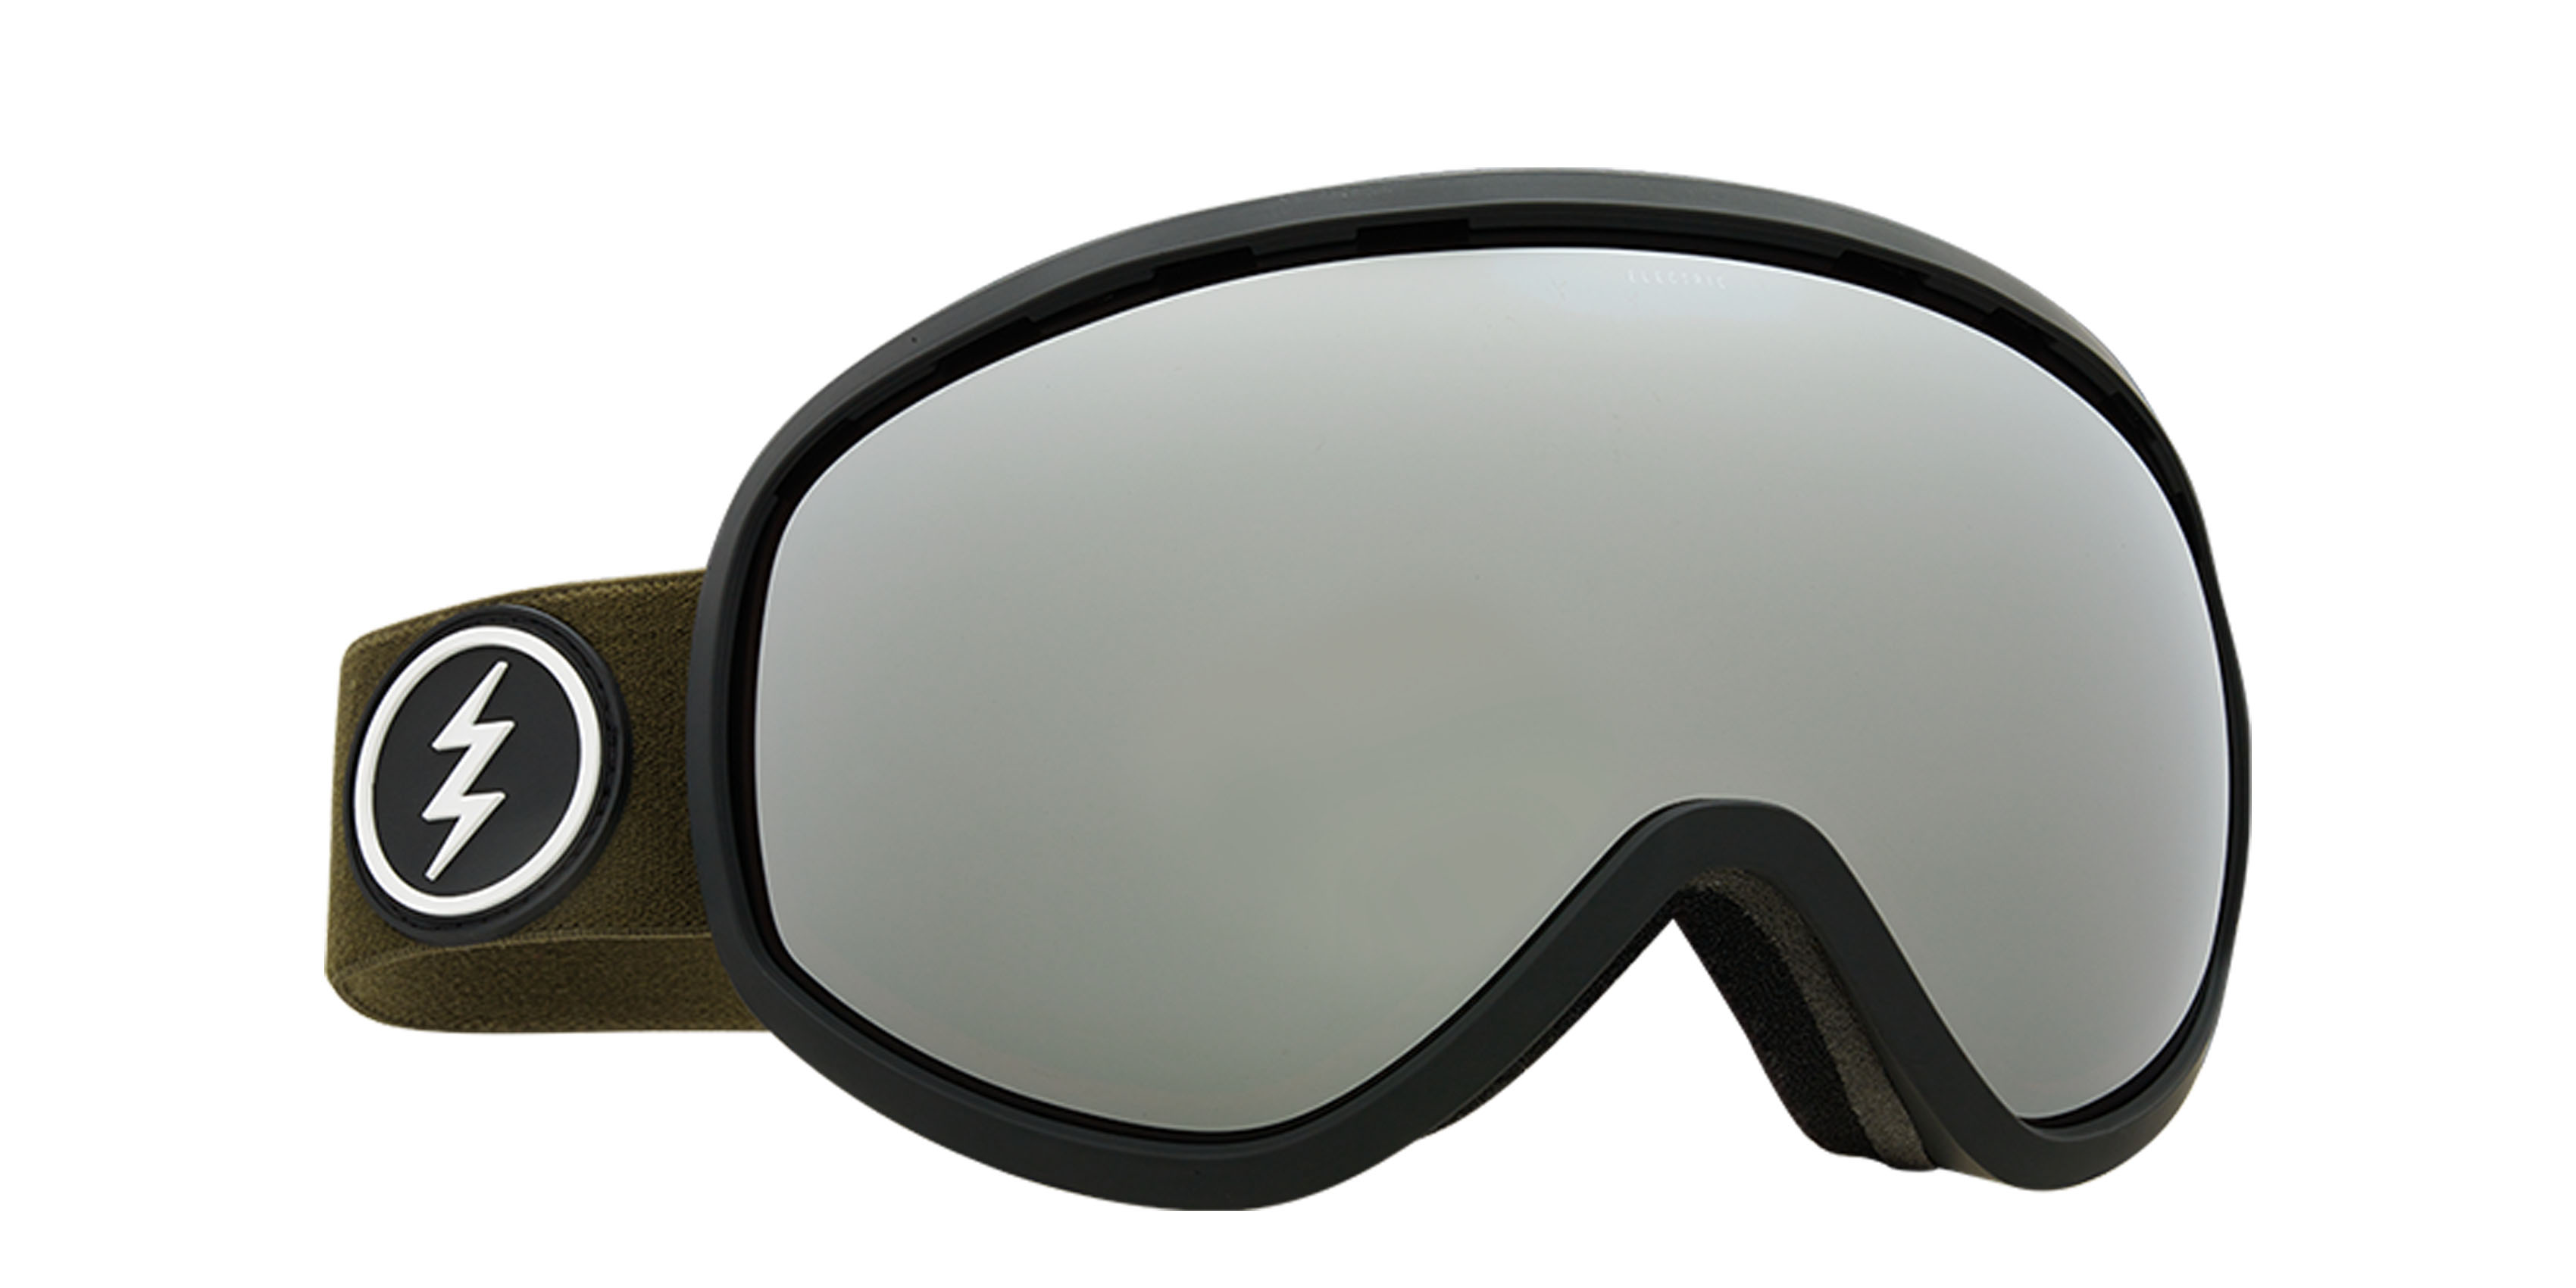 d92417c2e51e Electric Masher Snowboard Goggles 2018 - Dark Tourist w Brose Silver Chrome  + Bonus Choice Lens